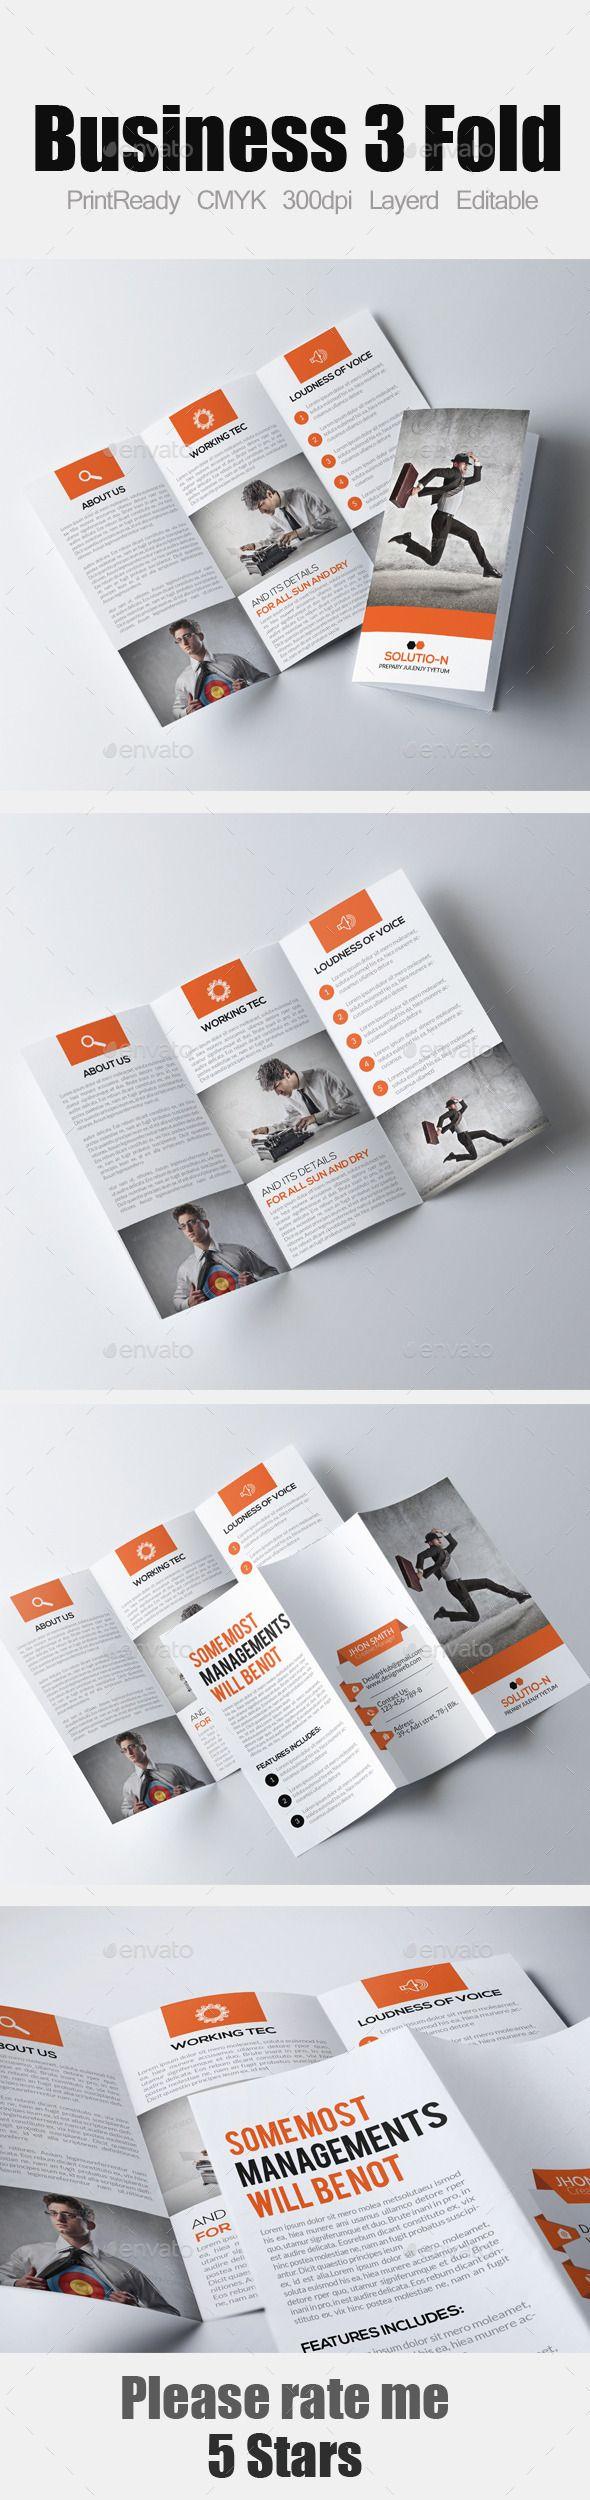 Tri Fold Business Brochure Template #design Download: http://graphicriver.net/item/tri-fold-business-brochure/12209493?ref=ksioks